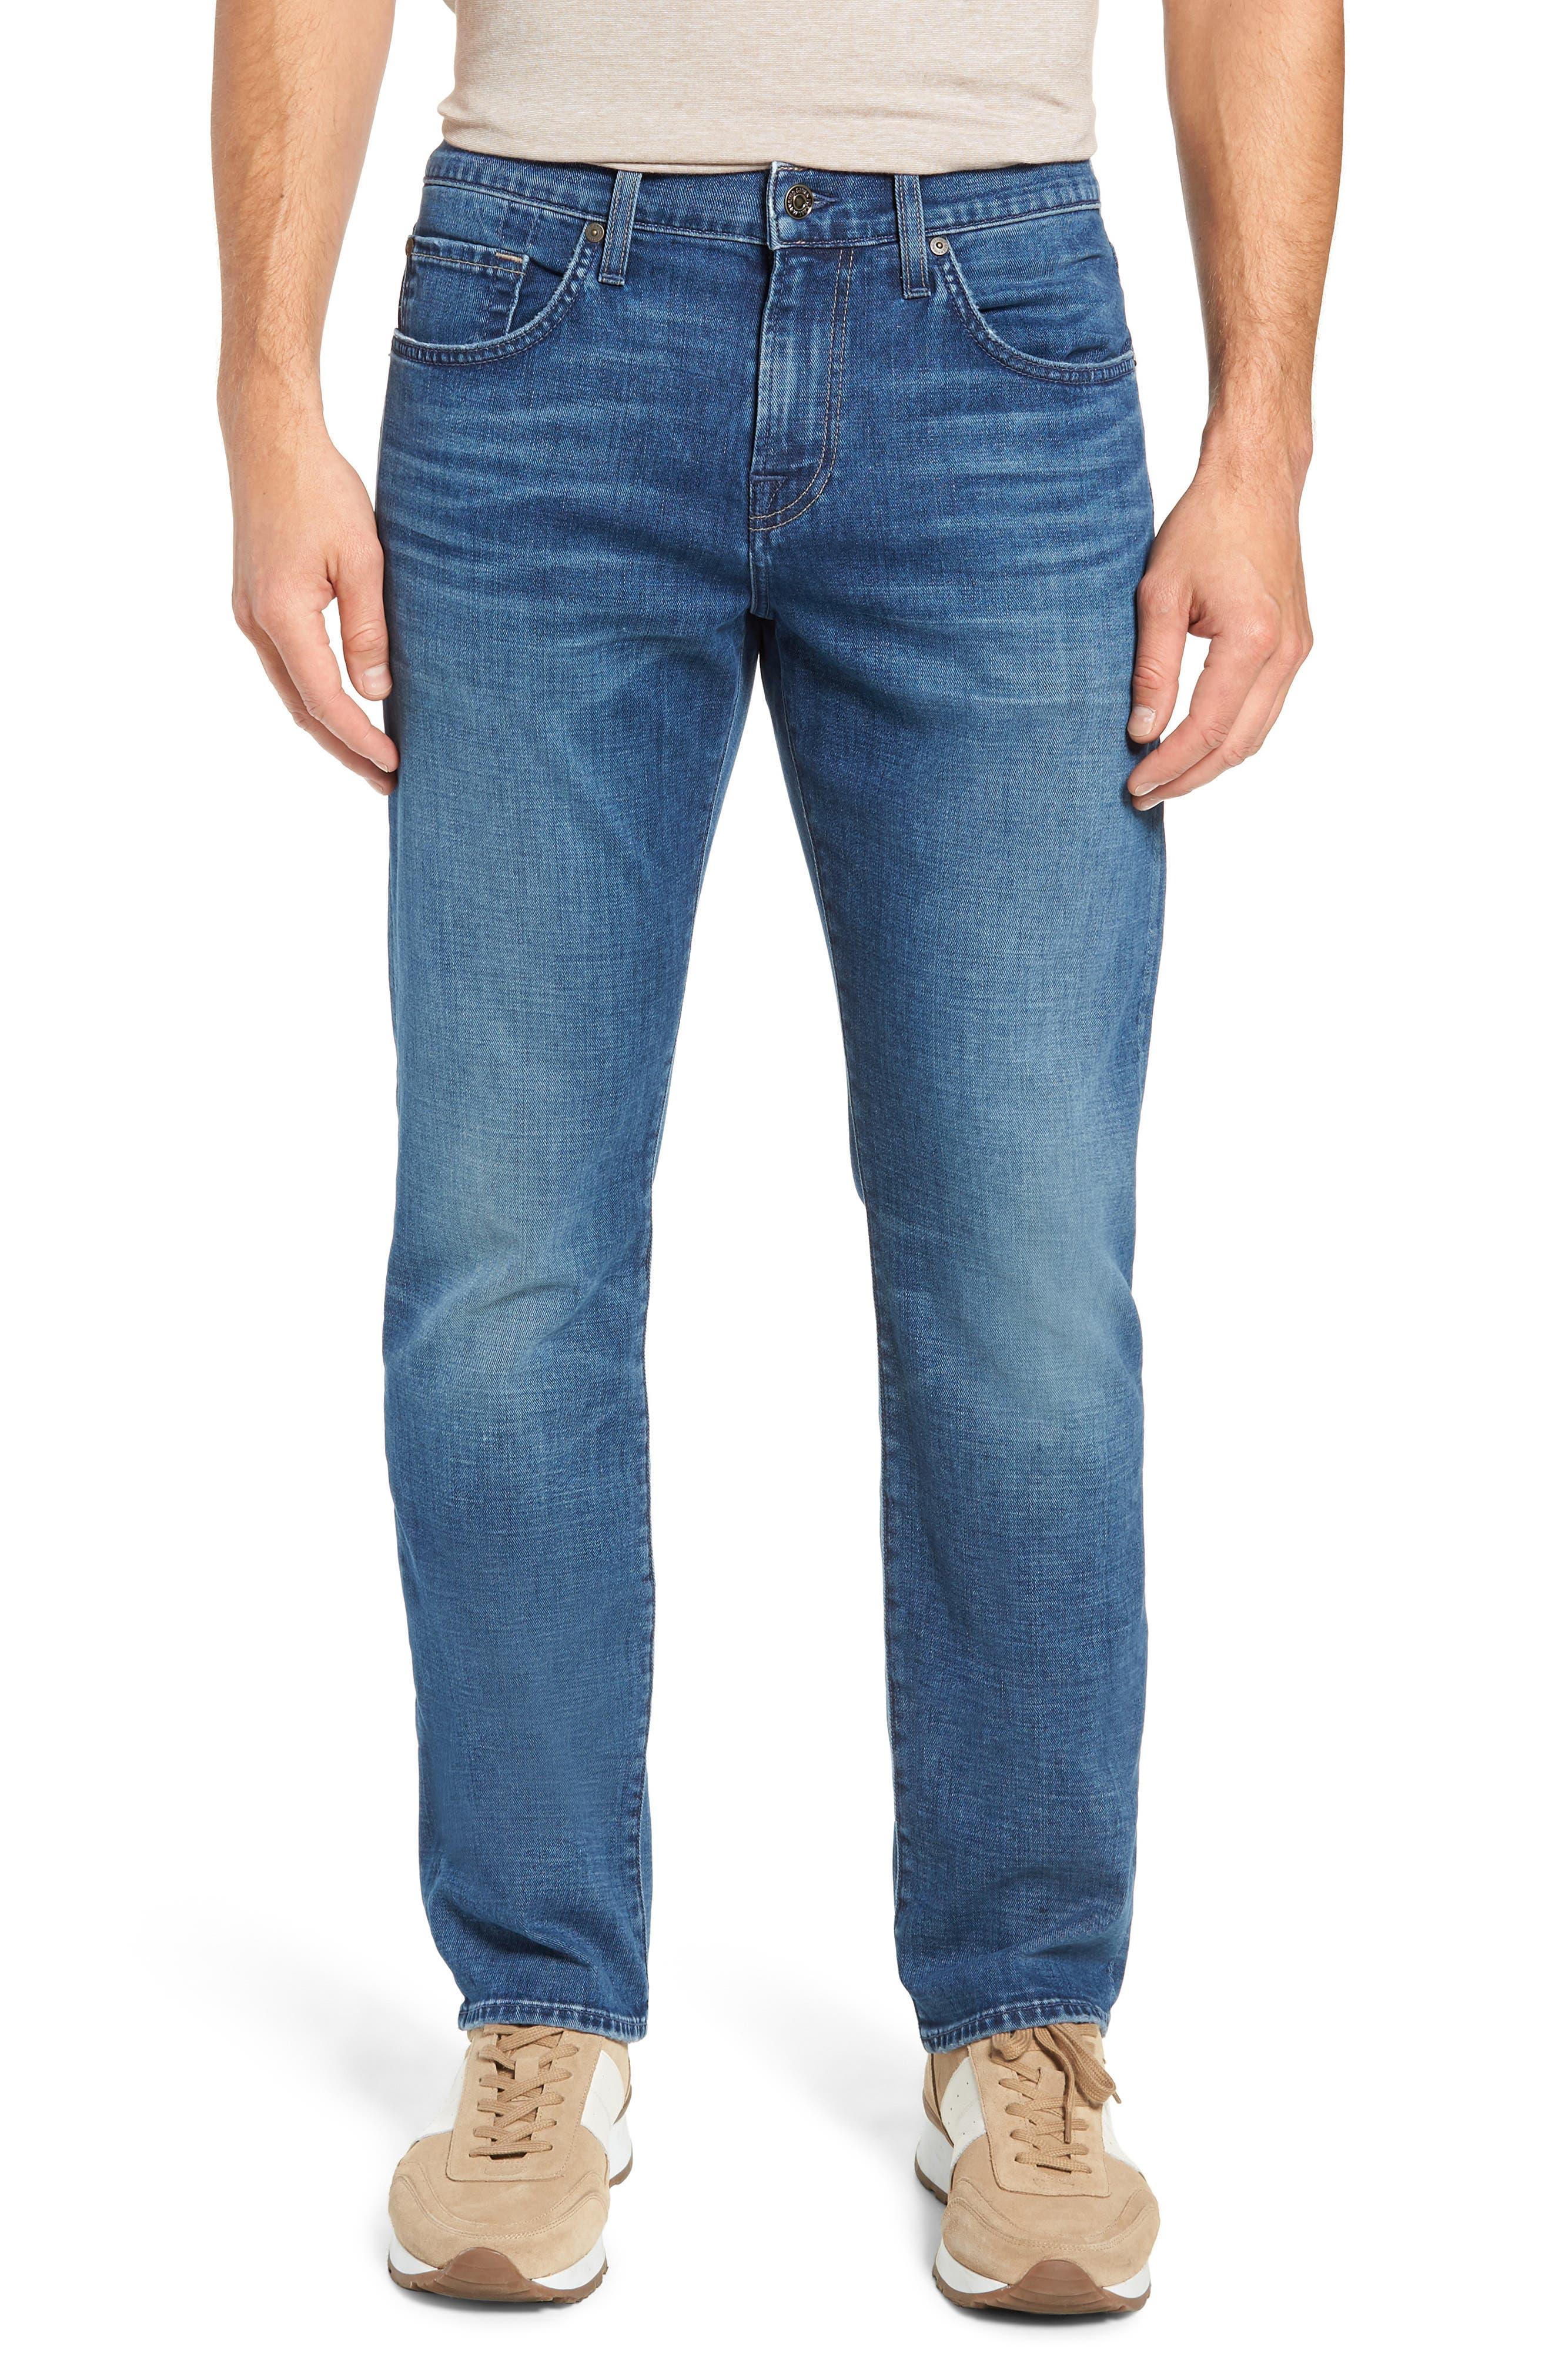 7 FOR ALL MANKIND<SUP>®</SUP>, Straight Slim Straight Leg Jeans, Main thumbnail 1, color, LYNNWOOD-LYNN